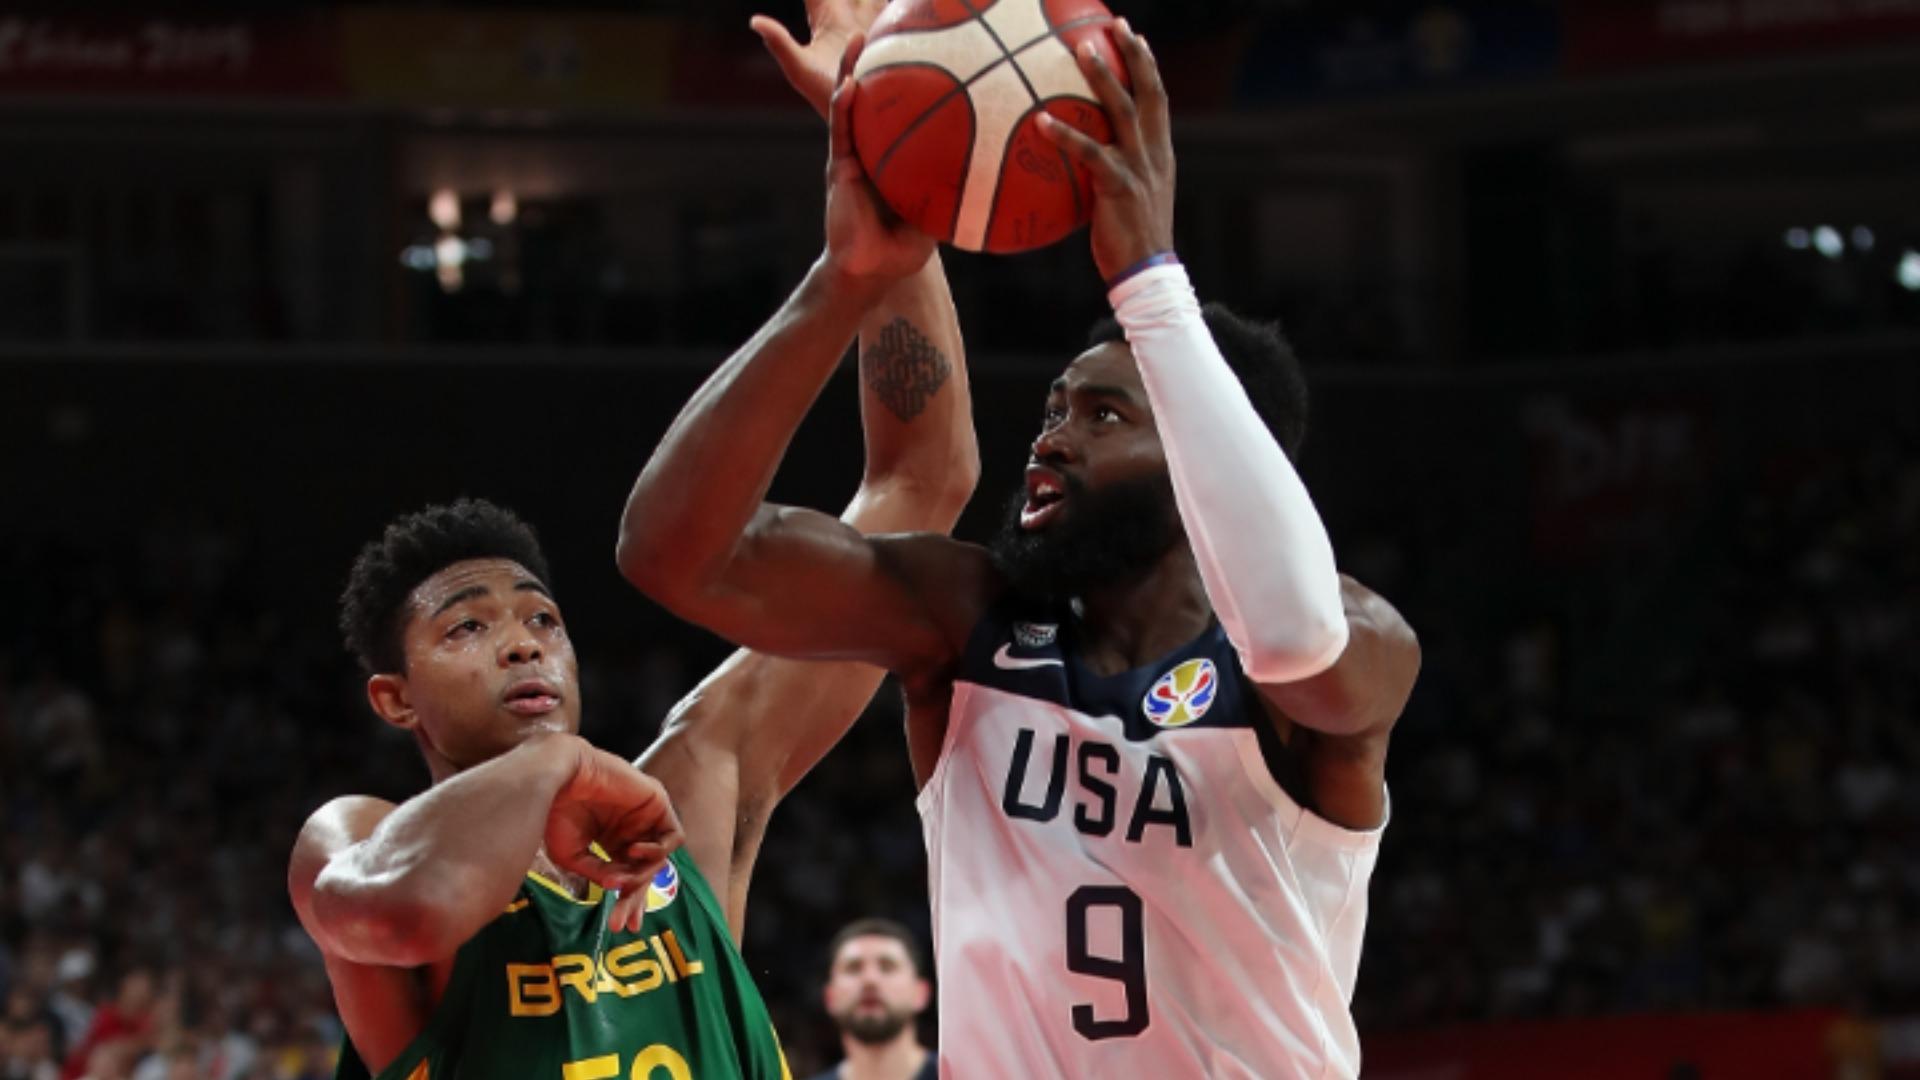 FIBA World Cup 2019: Team USA beat Brazil to secure Olympic spot